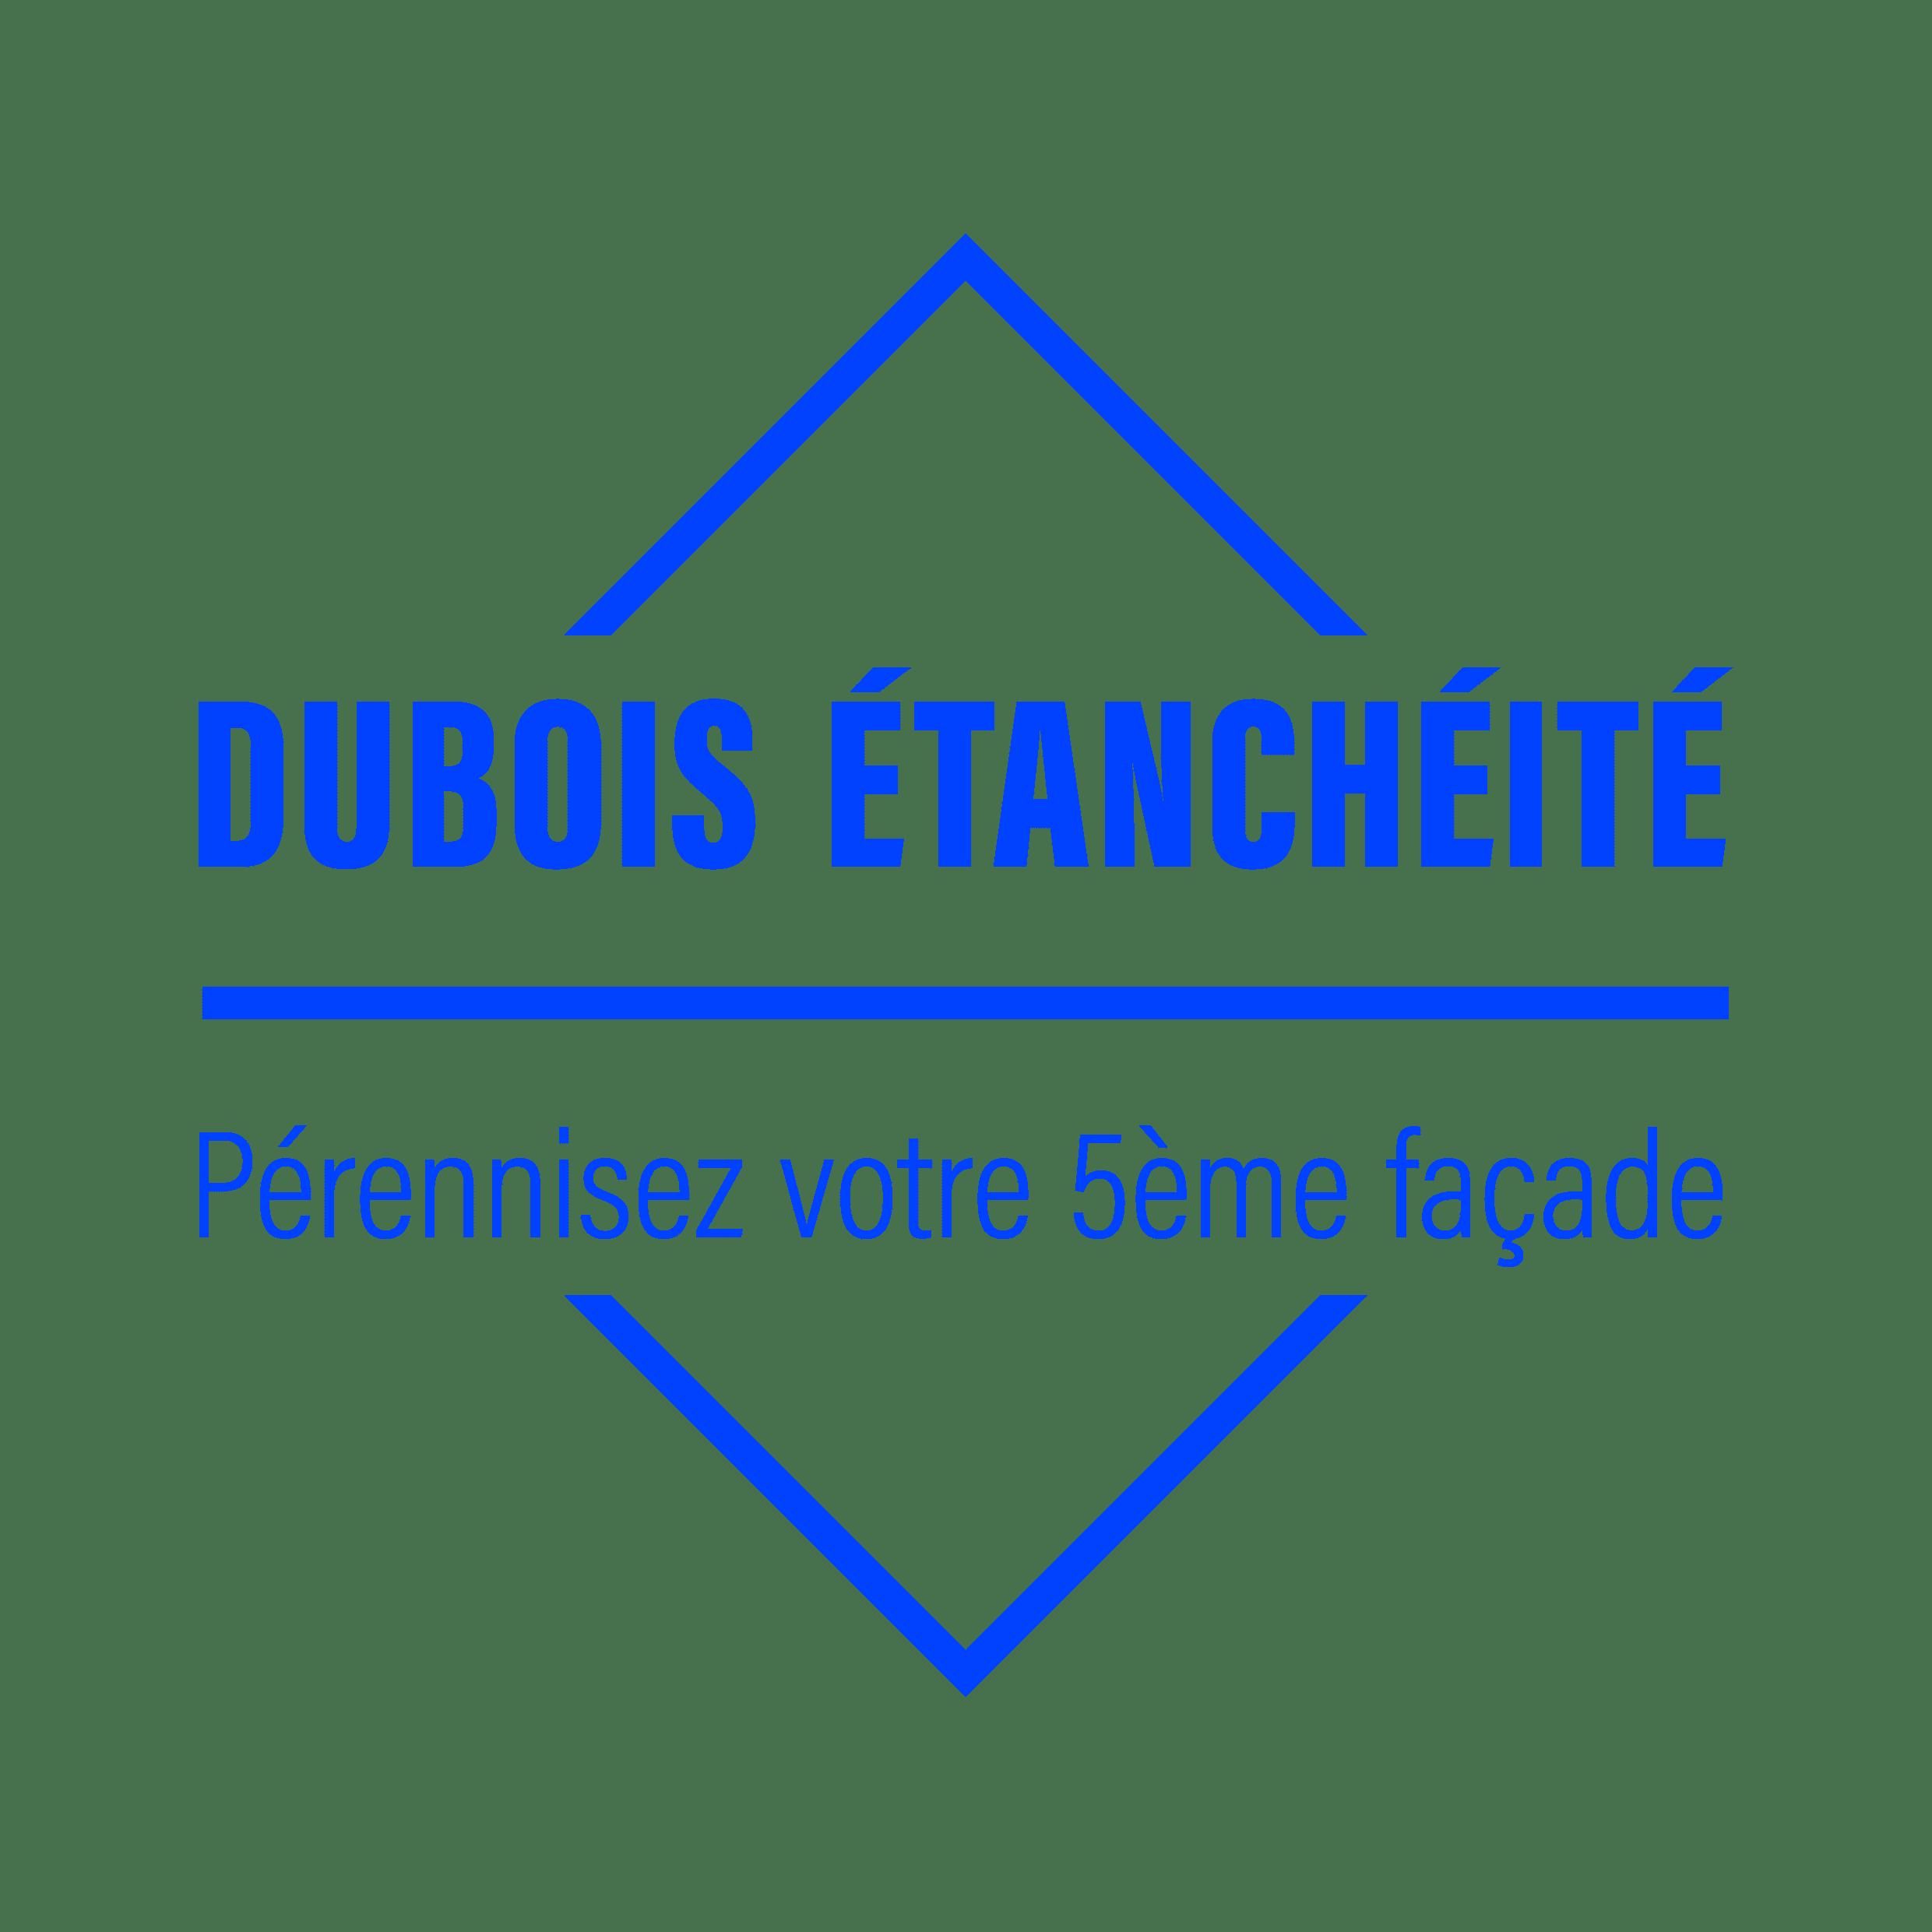 Dubois Etanchéité